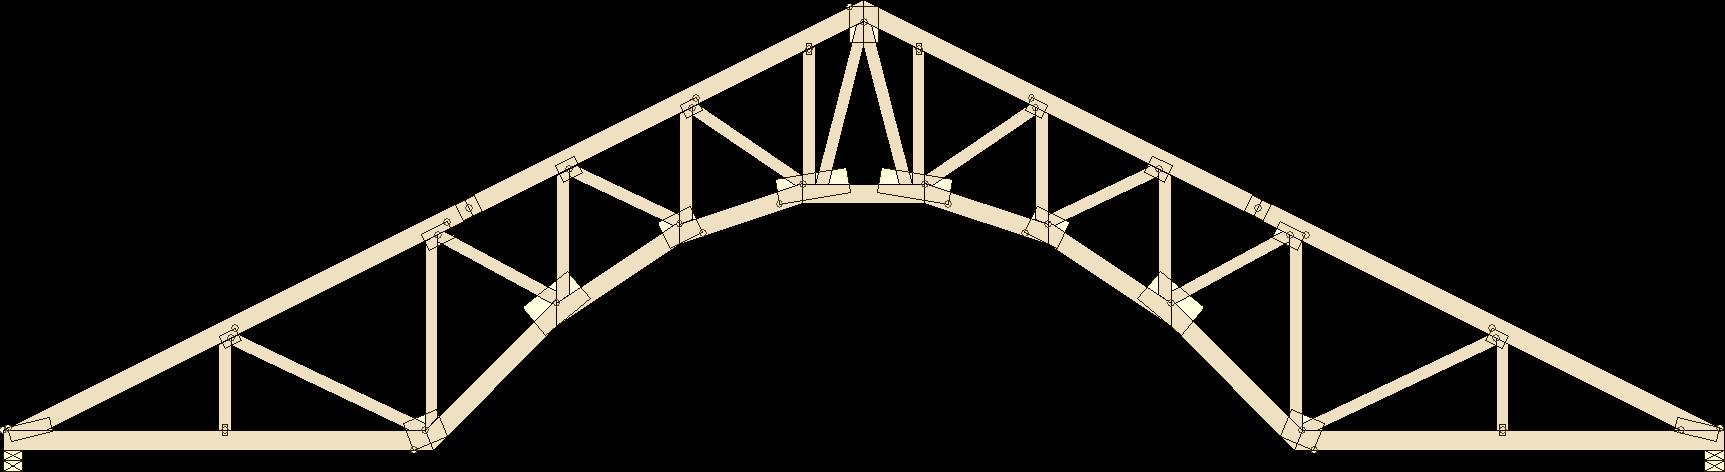 Monoslope Roof Truss Scissor Vaulted Trusses Sc 1 St